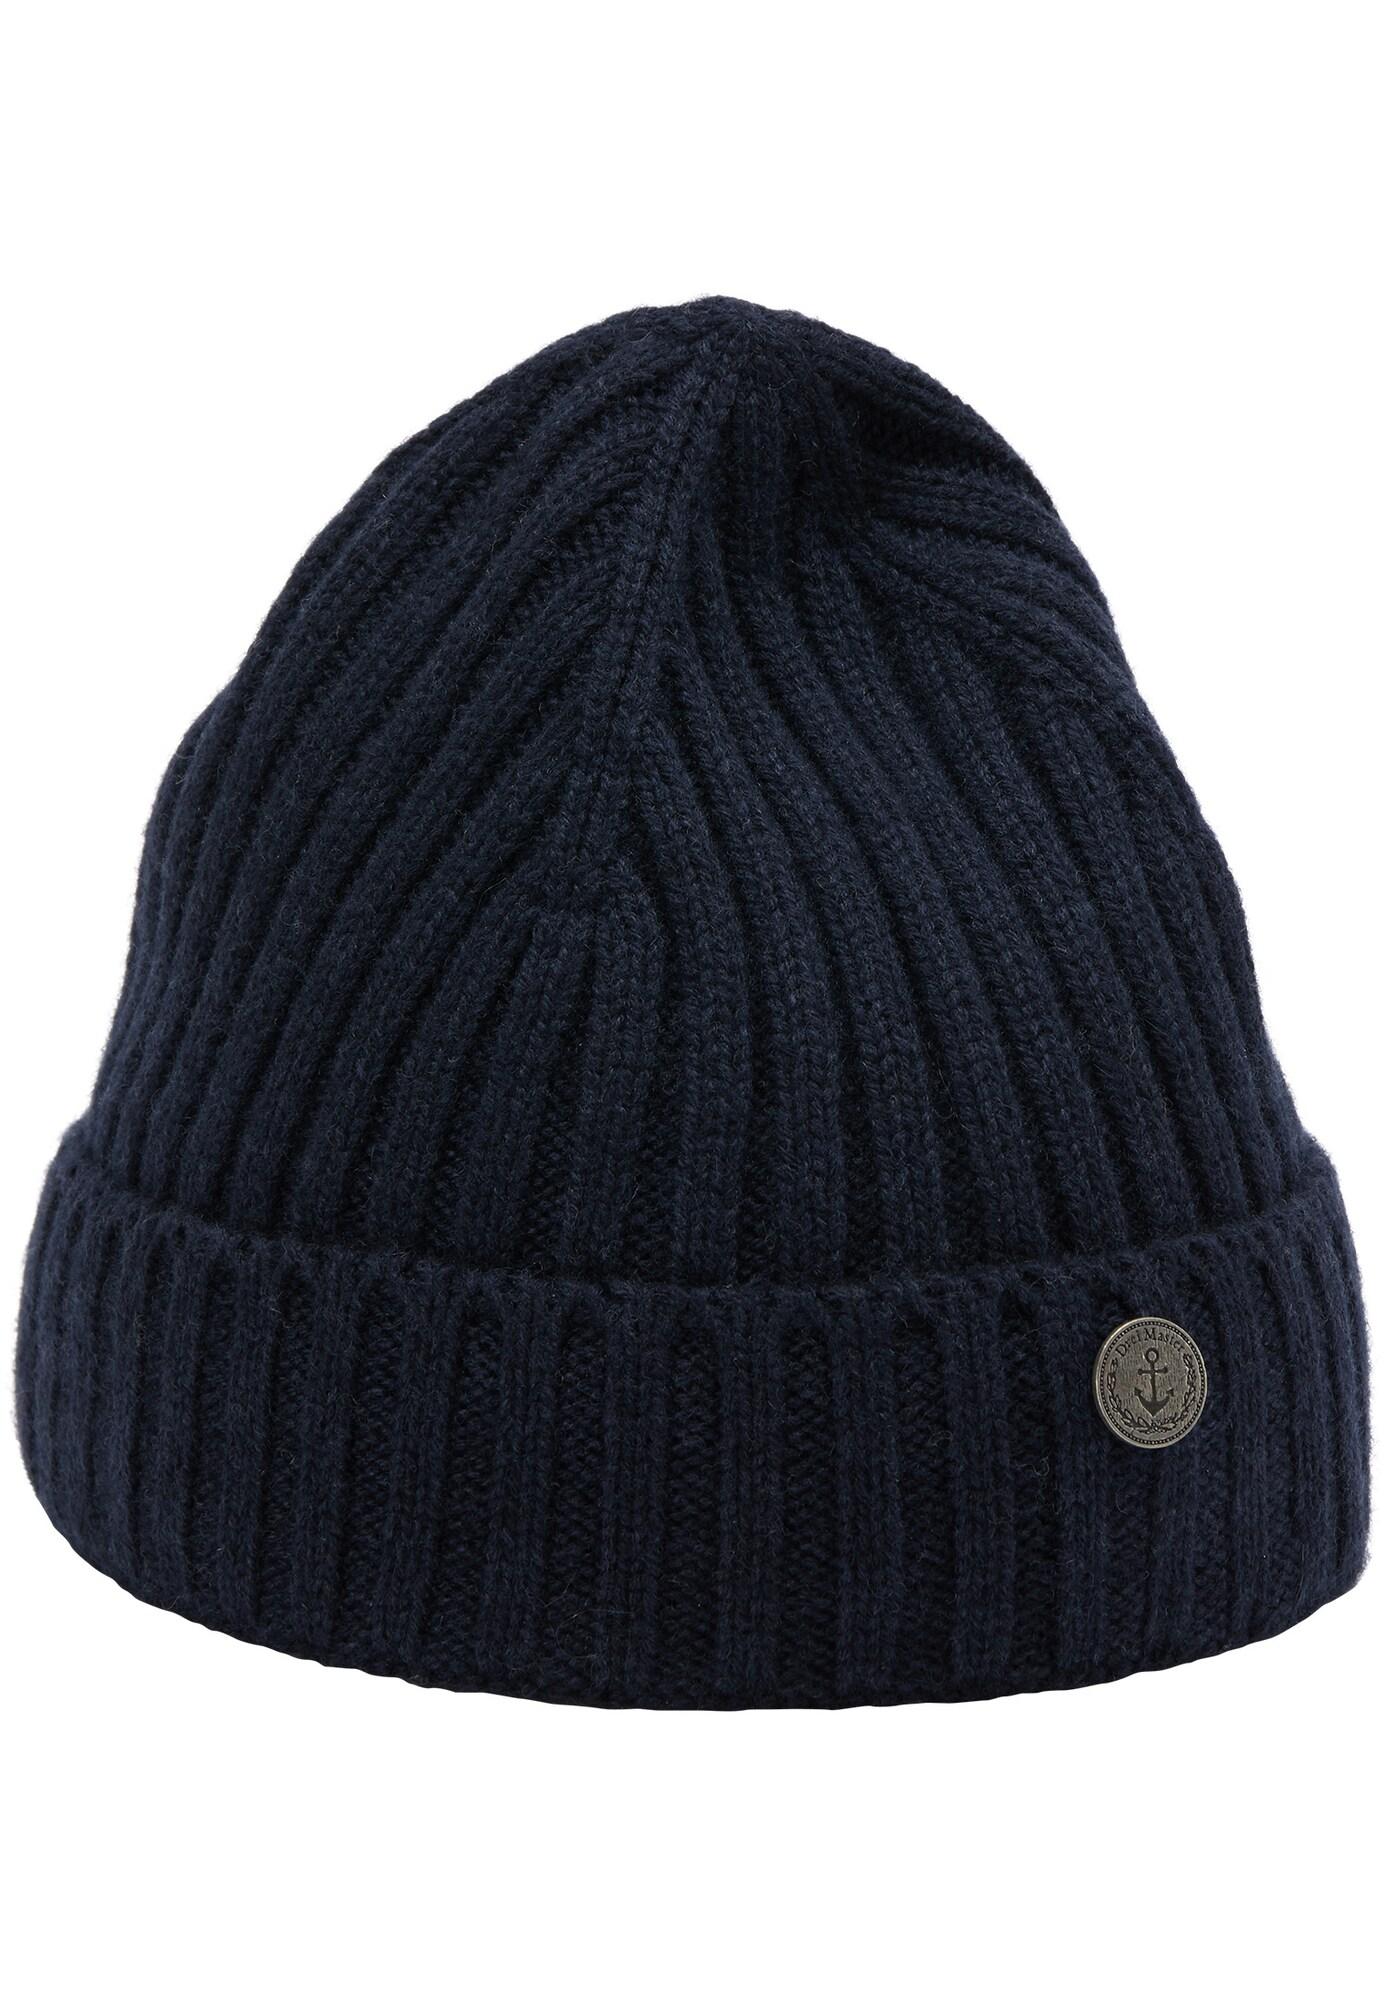 DreiMaster Vintage Megzta kepurė tamsiai mėlyna jūros spalva